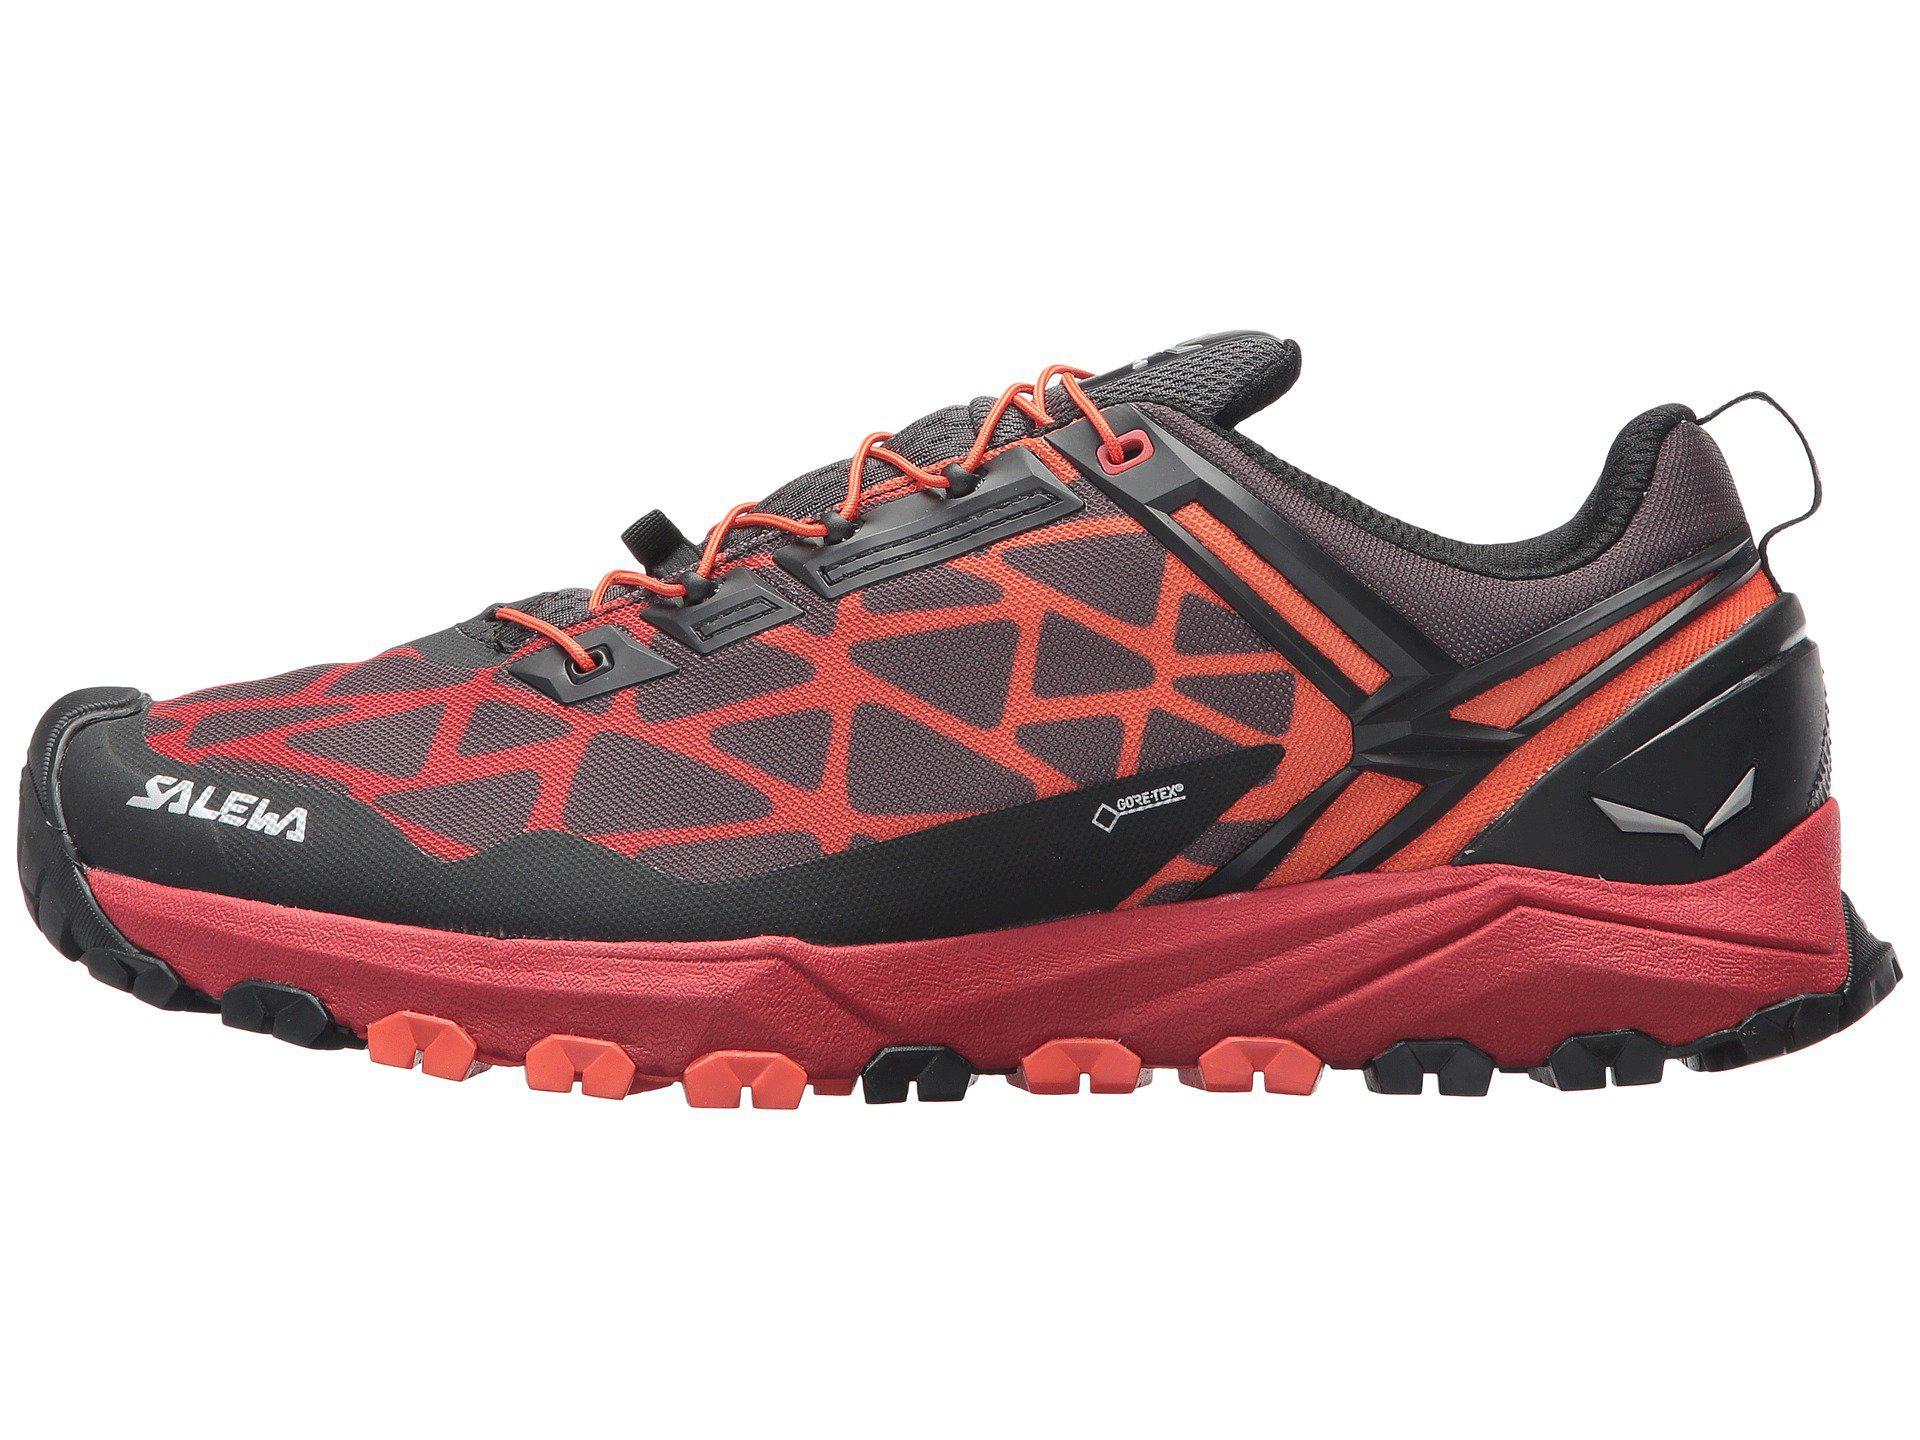 Multi Track Gtx (blacksilver) Men's Shoes